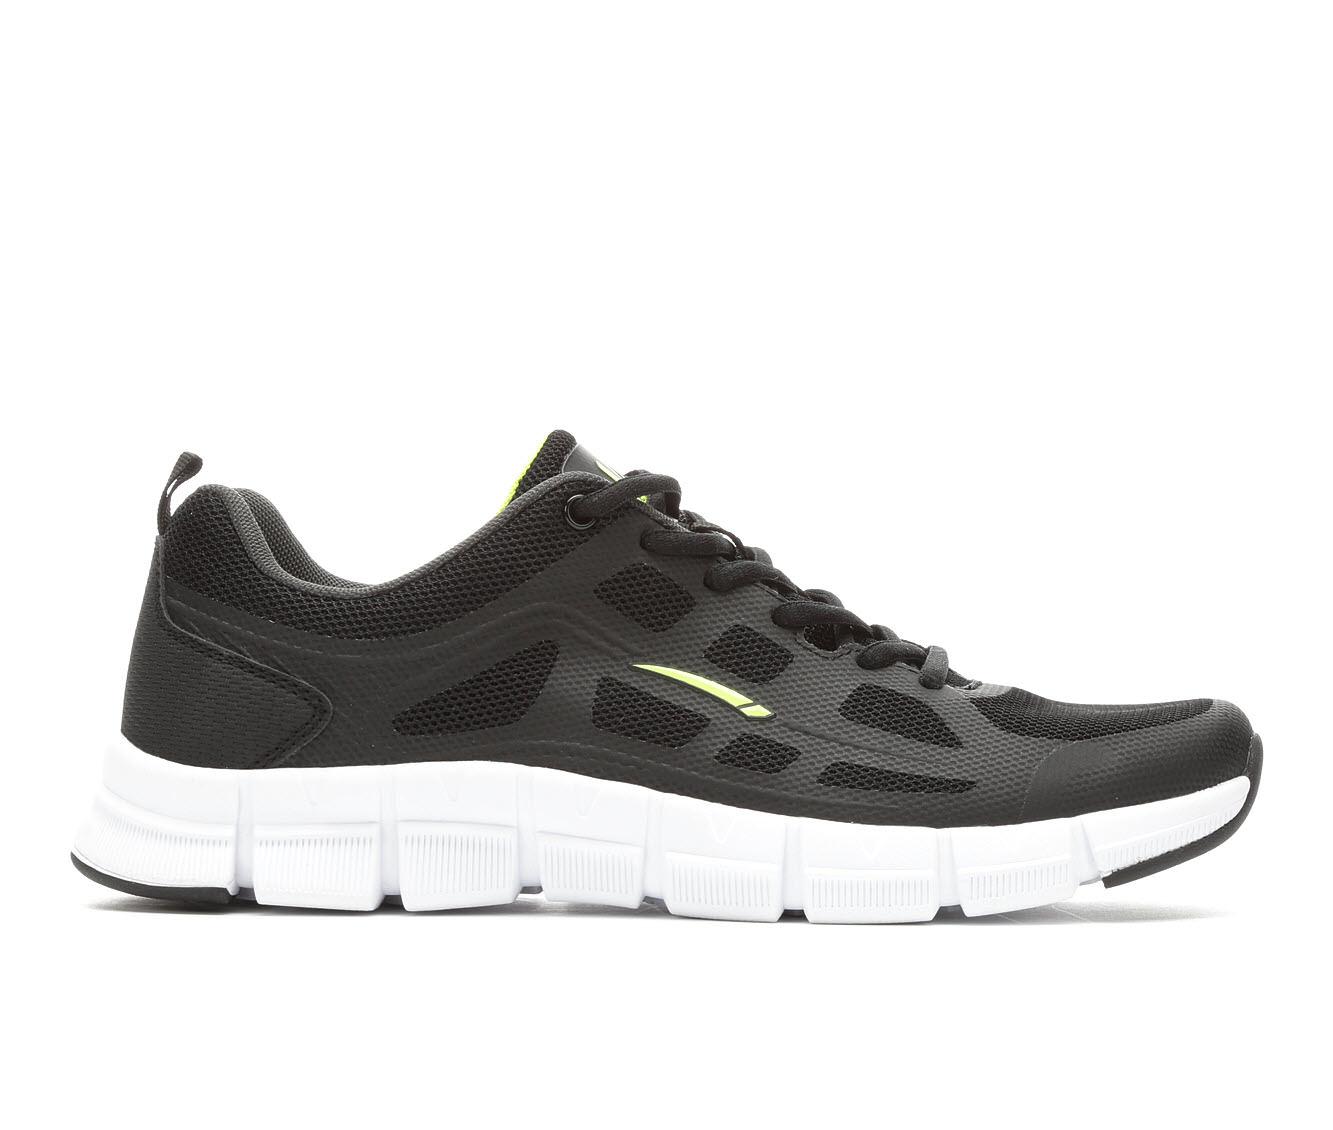 Men's L.A. Gear Mast Running Shoes (Black - Size 8) 1658033